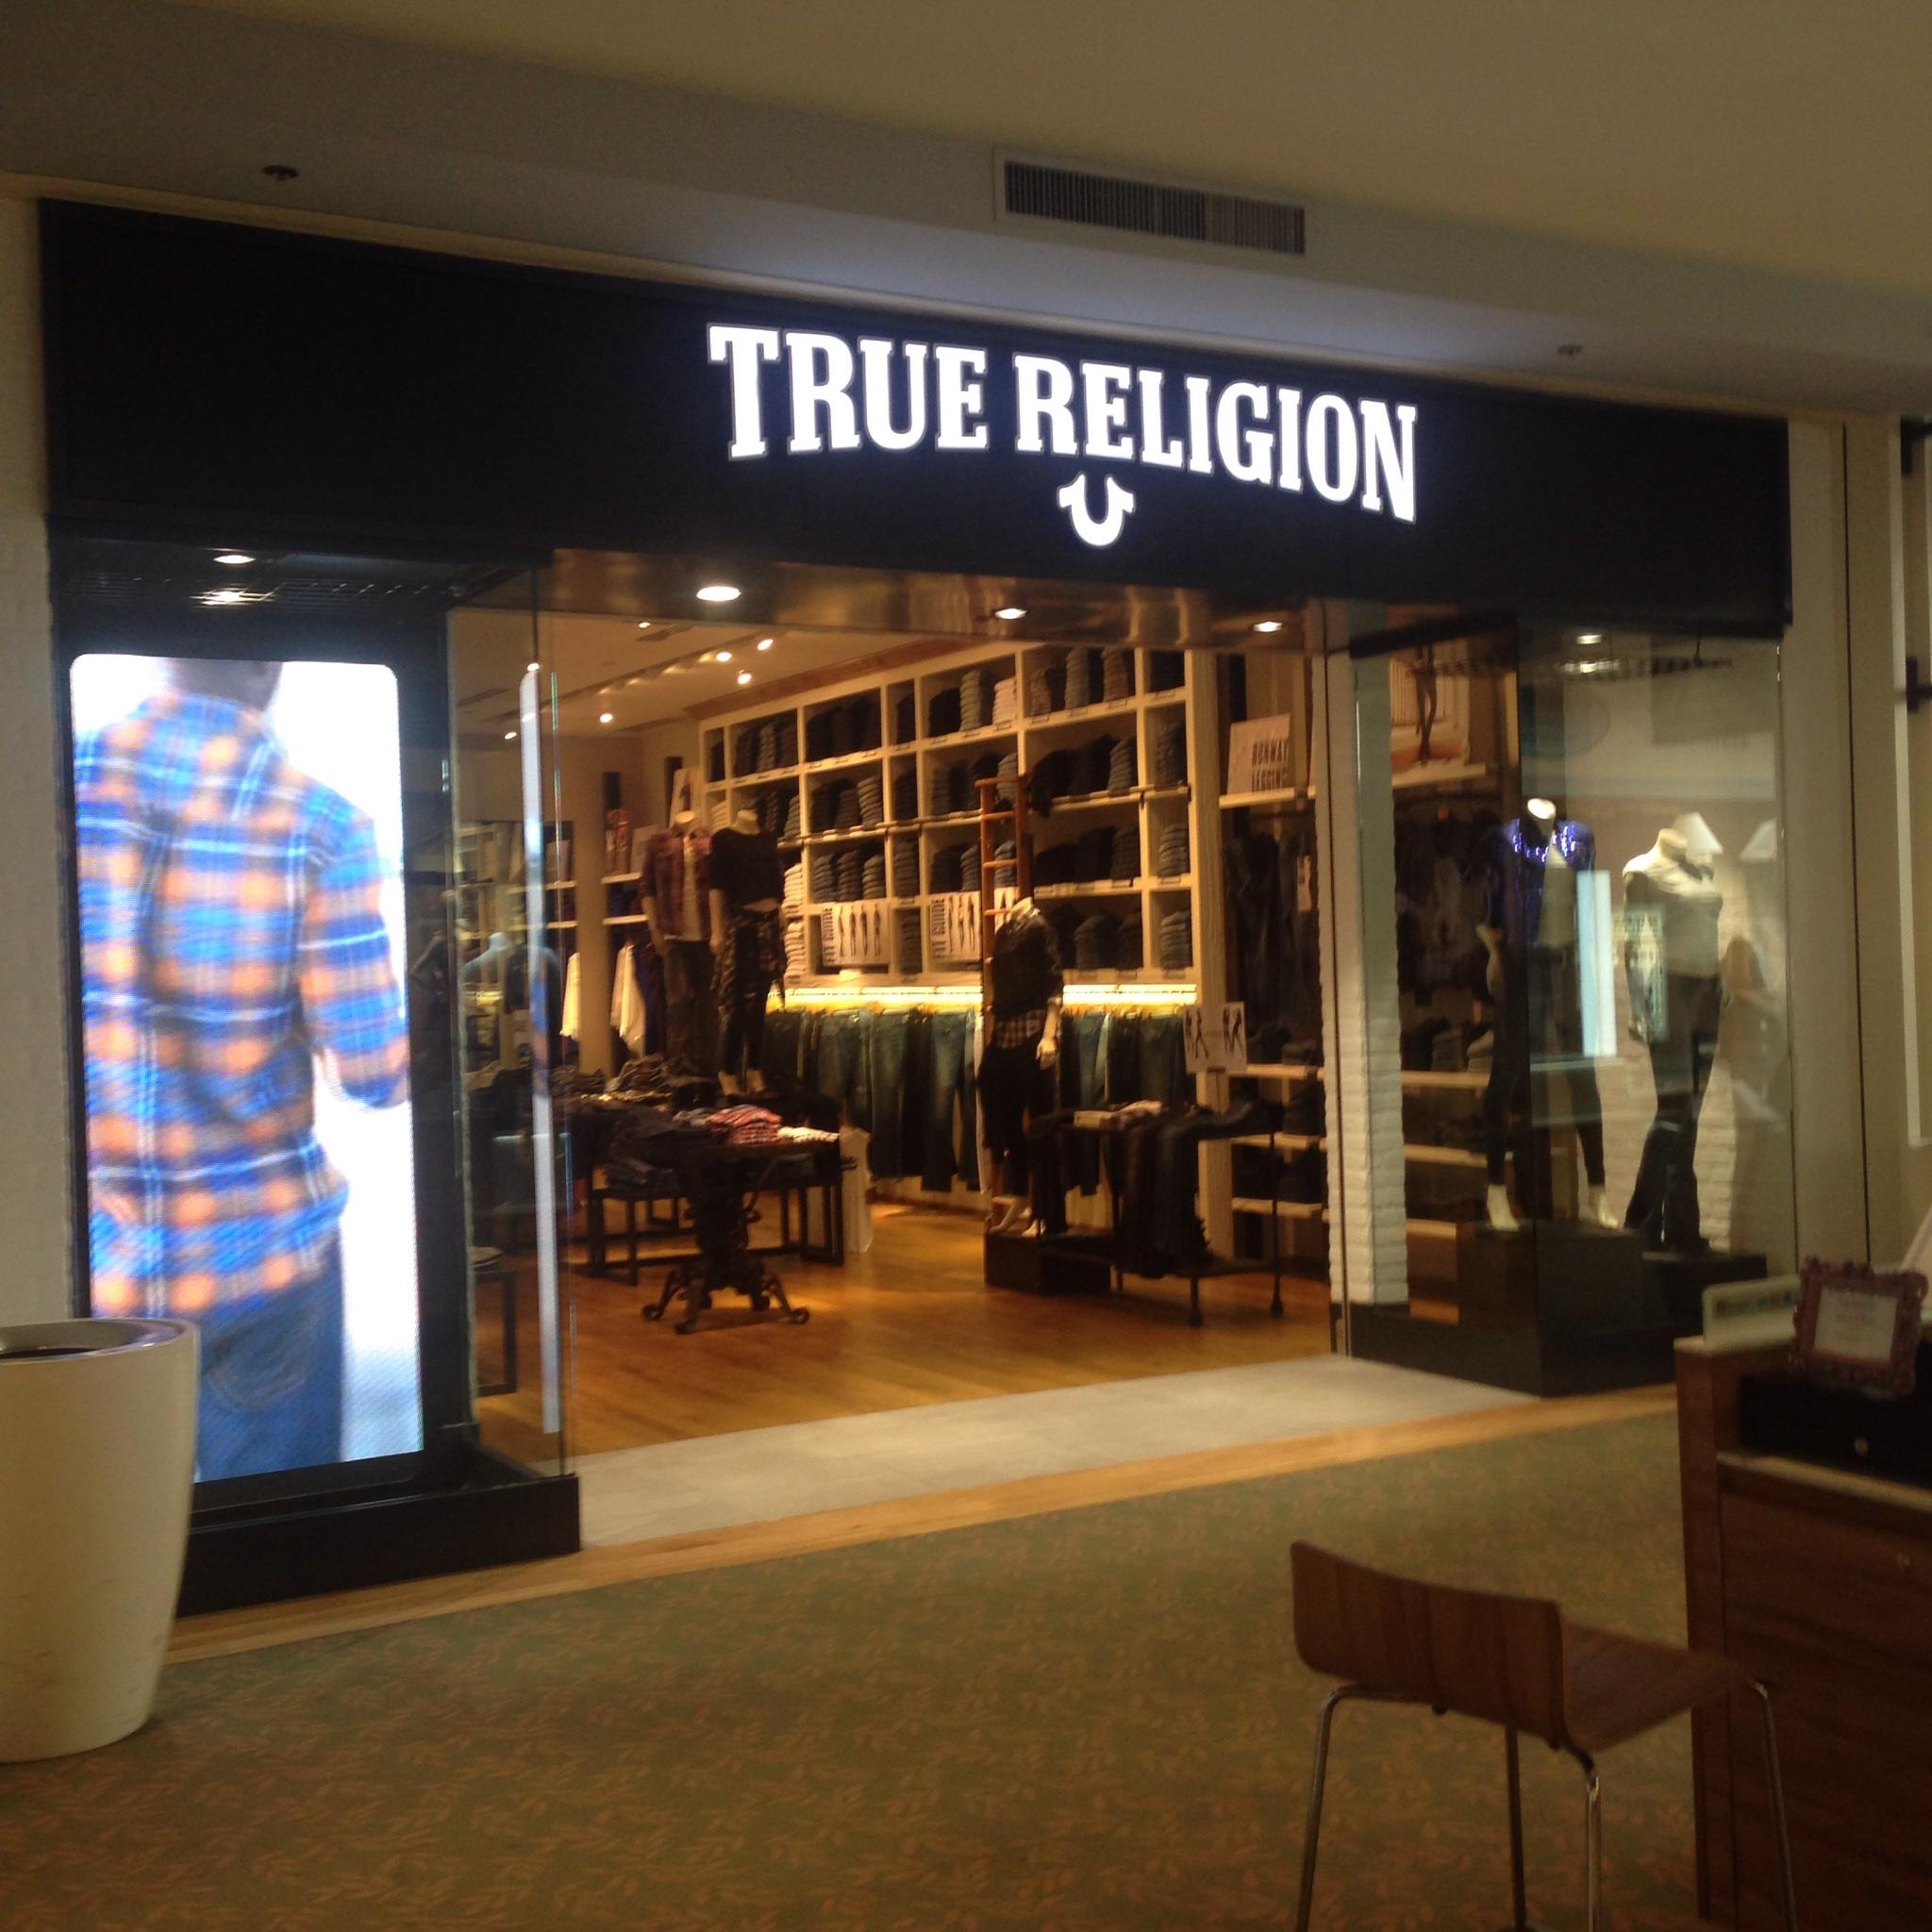 7fdbe513f True Religion Jeans 4400 Ashford Dunwoody Rd NE Ste 2350